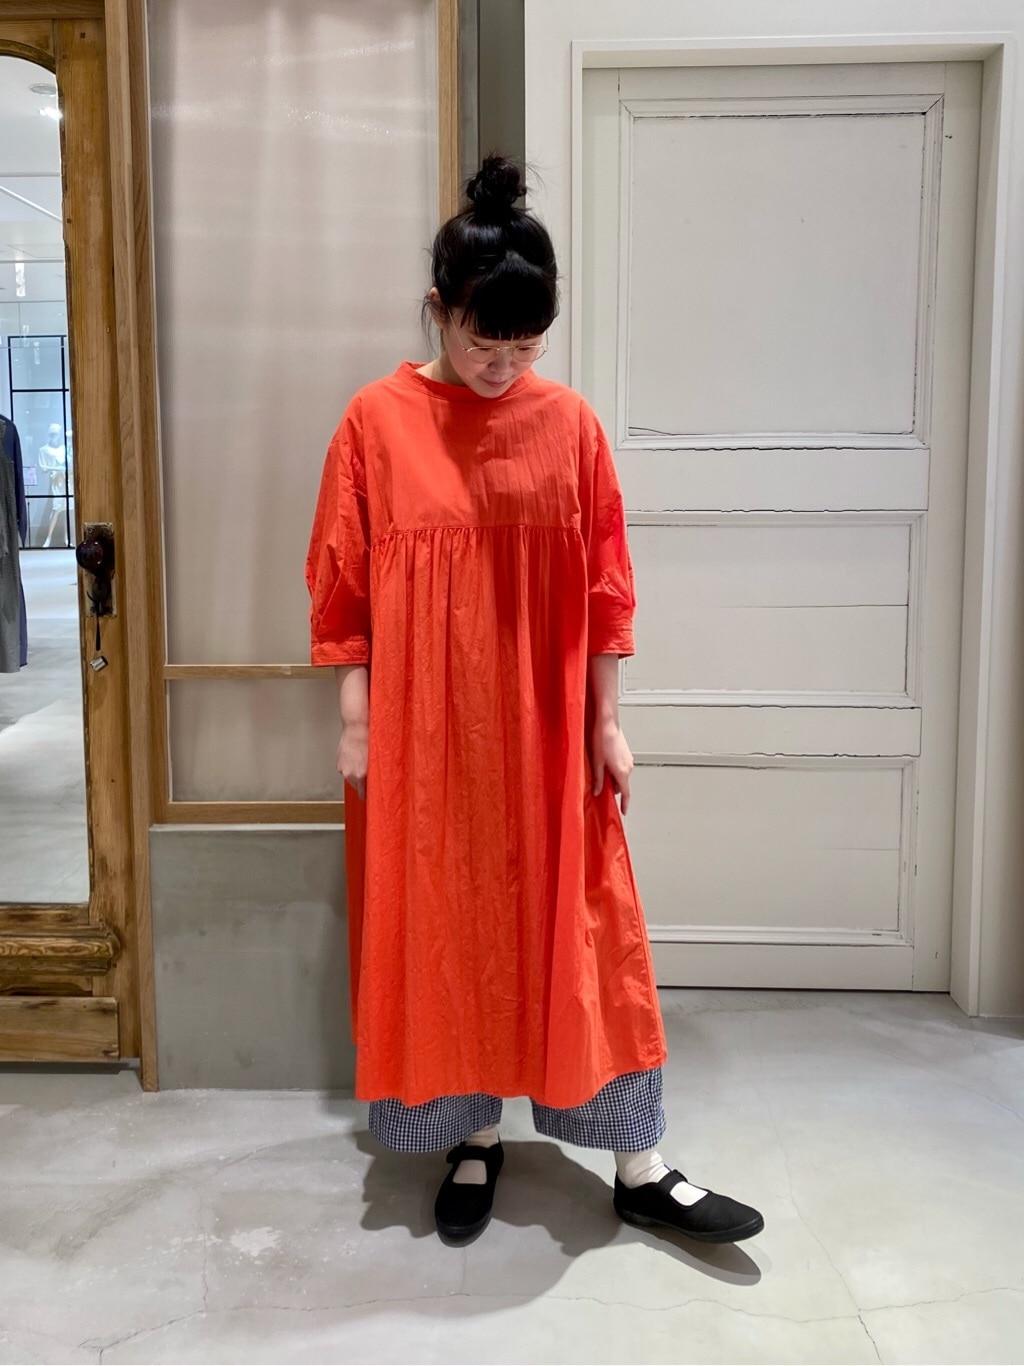 bulle de savon 渋谷スクランブルスクエア 身長:158cm 2021.04.24